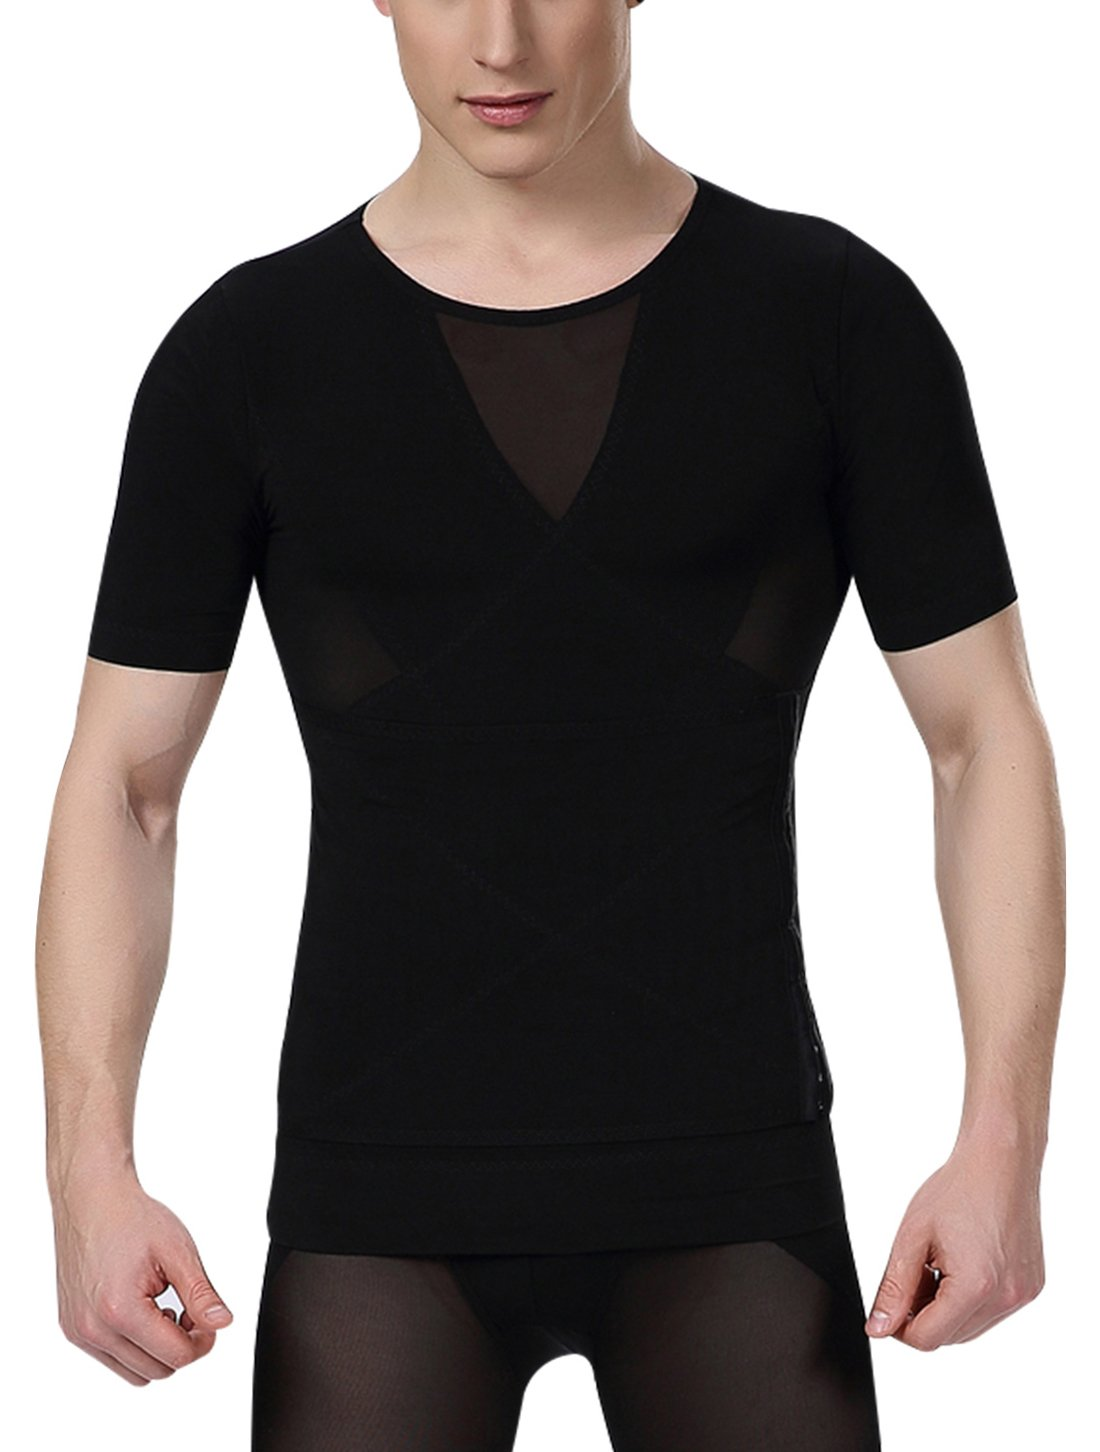 Aieoe Men's Compression Shirt to Hide Gynecomastia Moobs Chest Slimming Body Shaper Undershirt Size XL Black